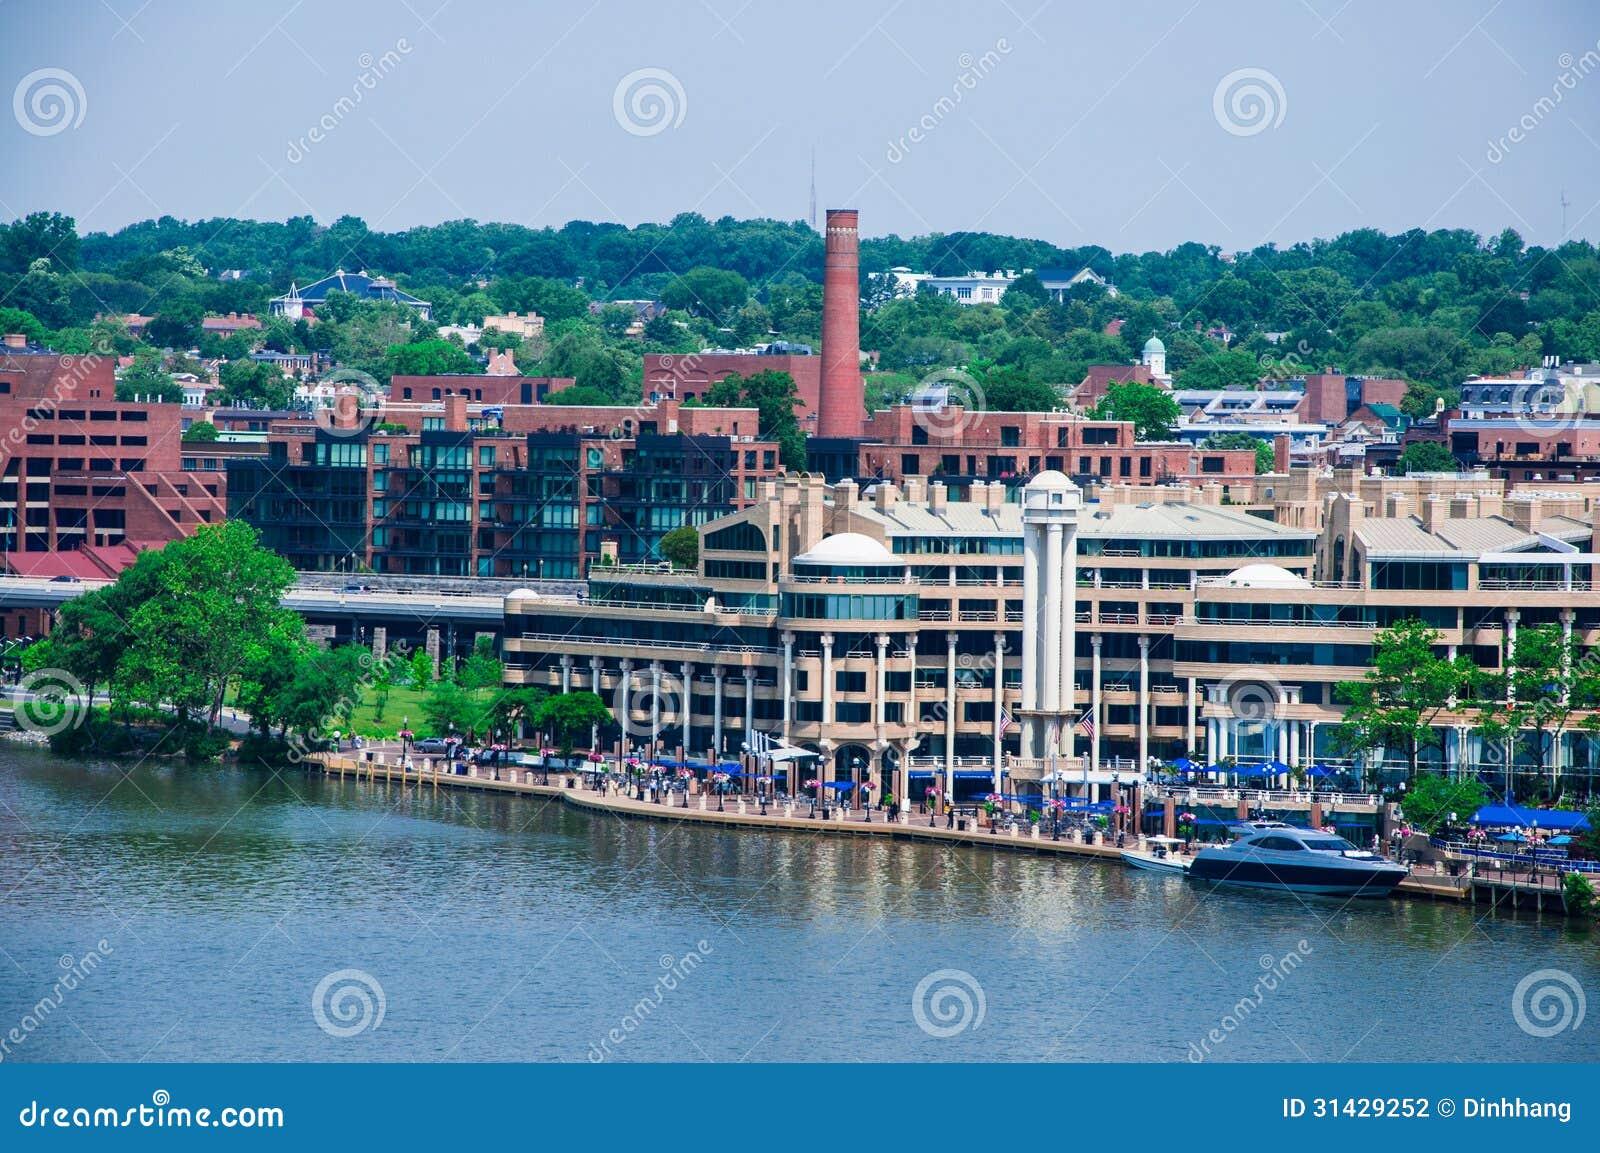 Washington DC By The Potomac River Stock Photography ...